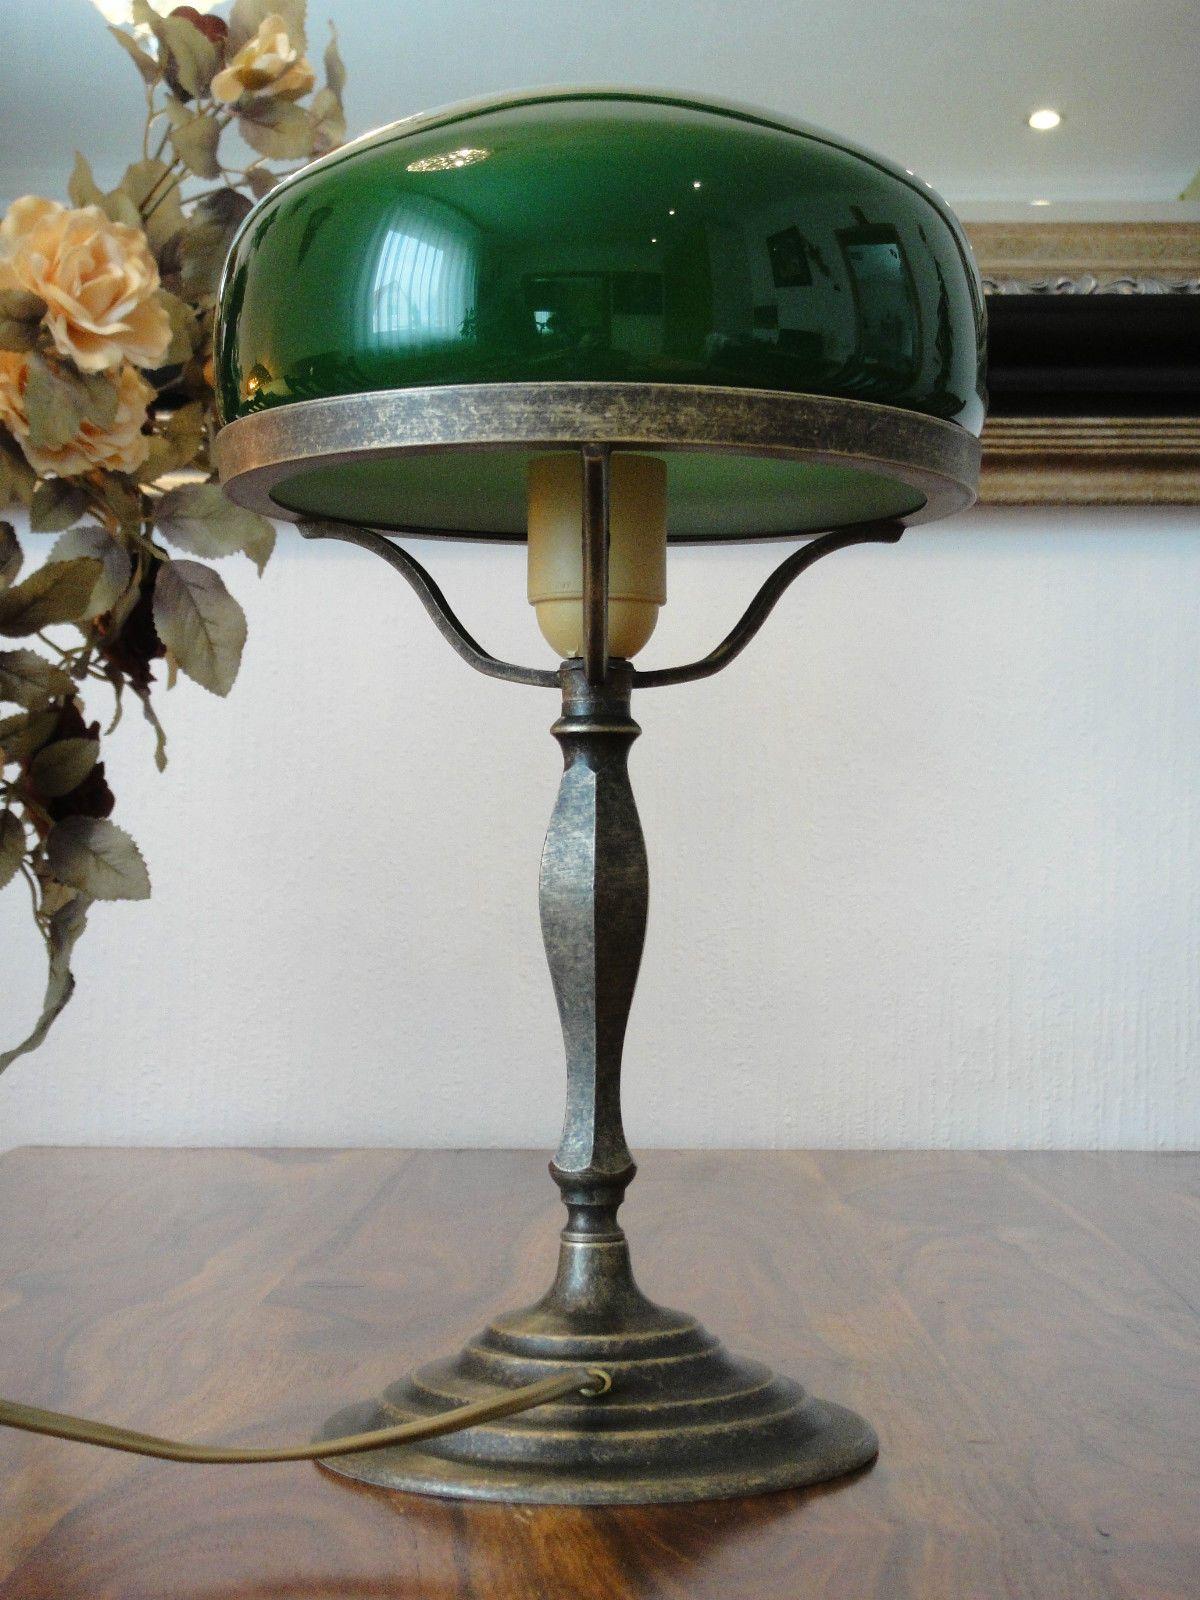 Details Zu Tischlampe Pilz Lampe Jugendstil Antik Bankerlampe Schreibtischlampe Messing NEU